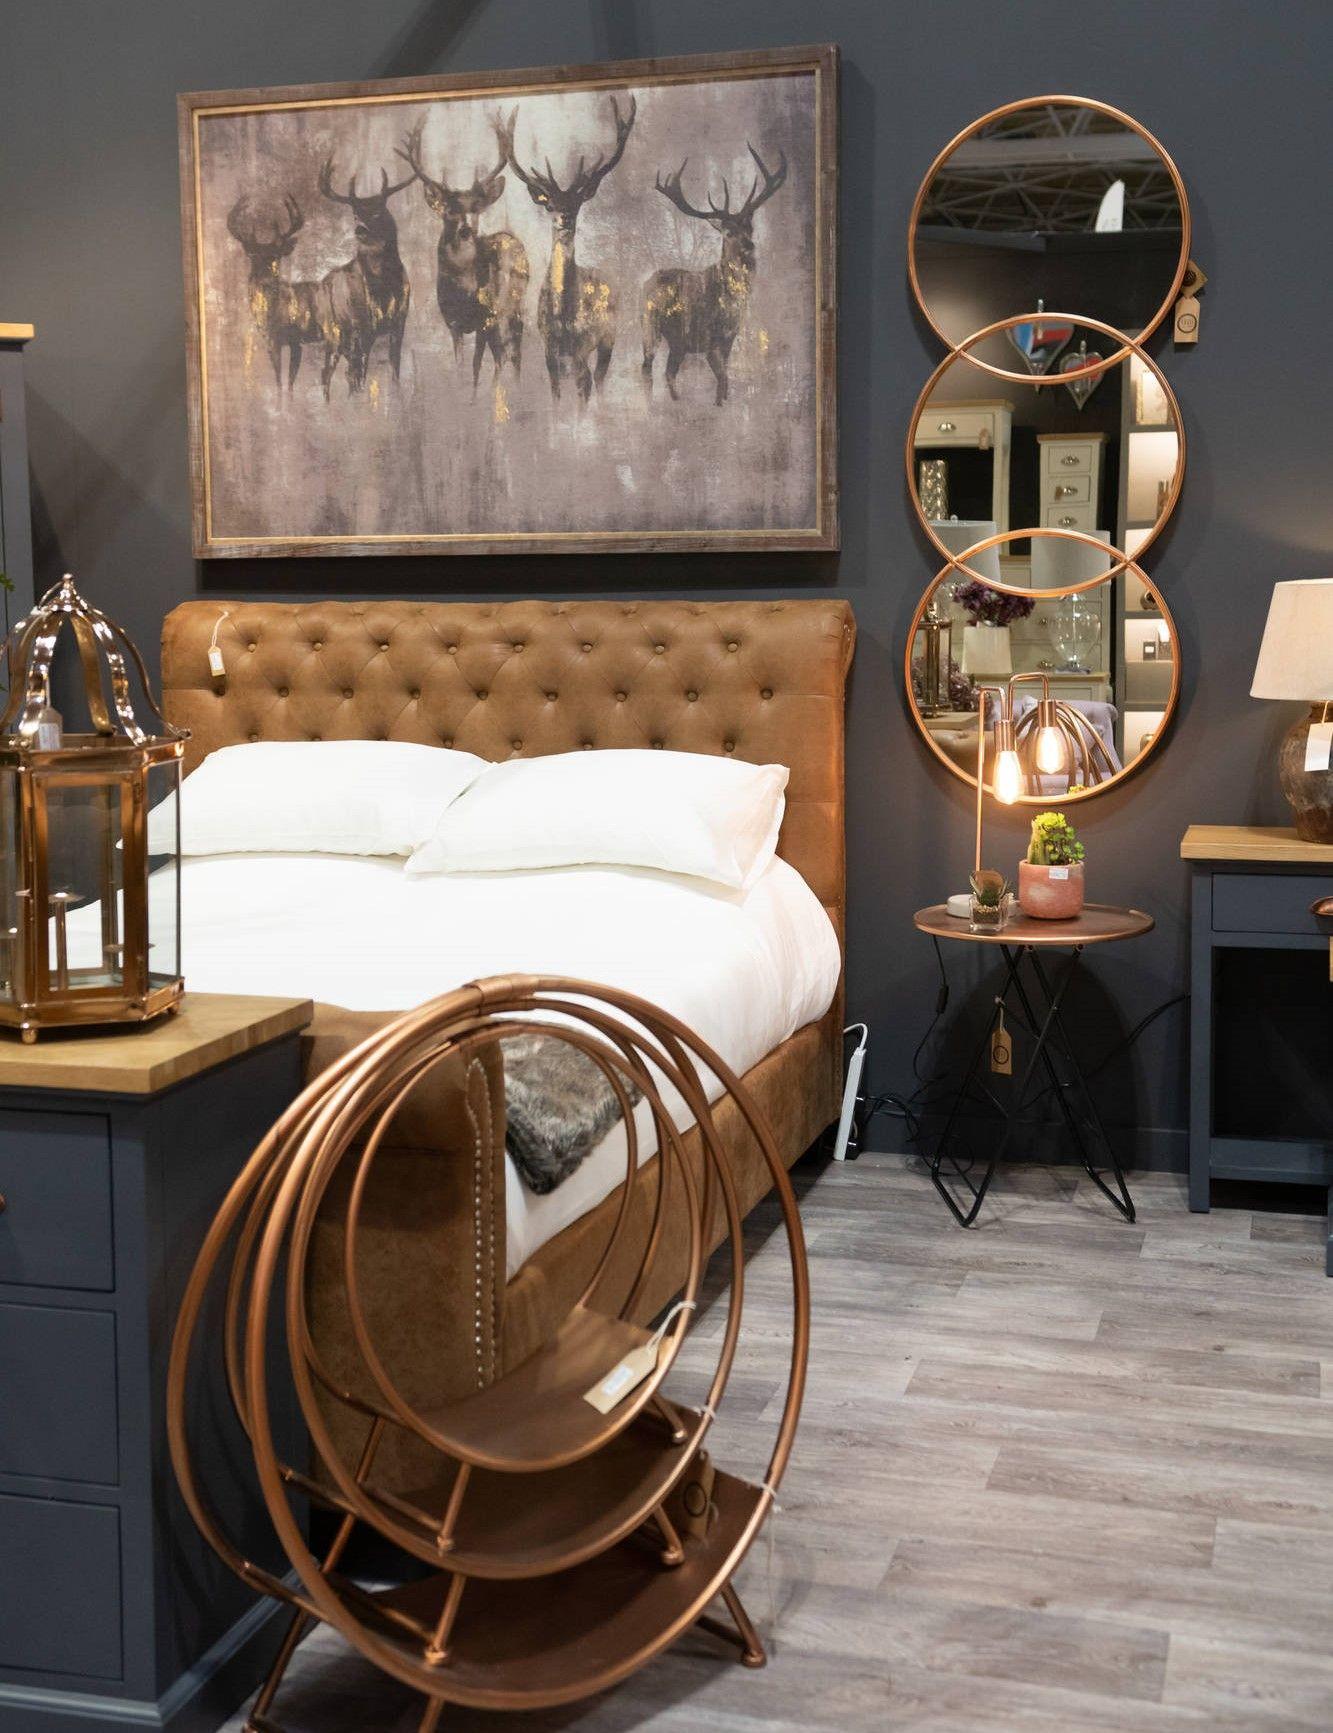 Industrial Bedroom Industrial style furniture, Furniture